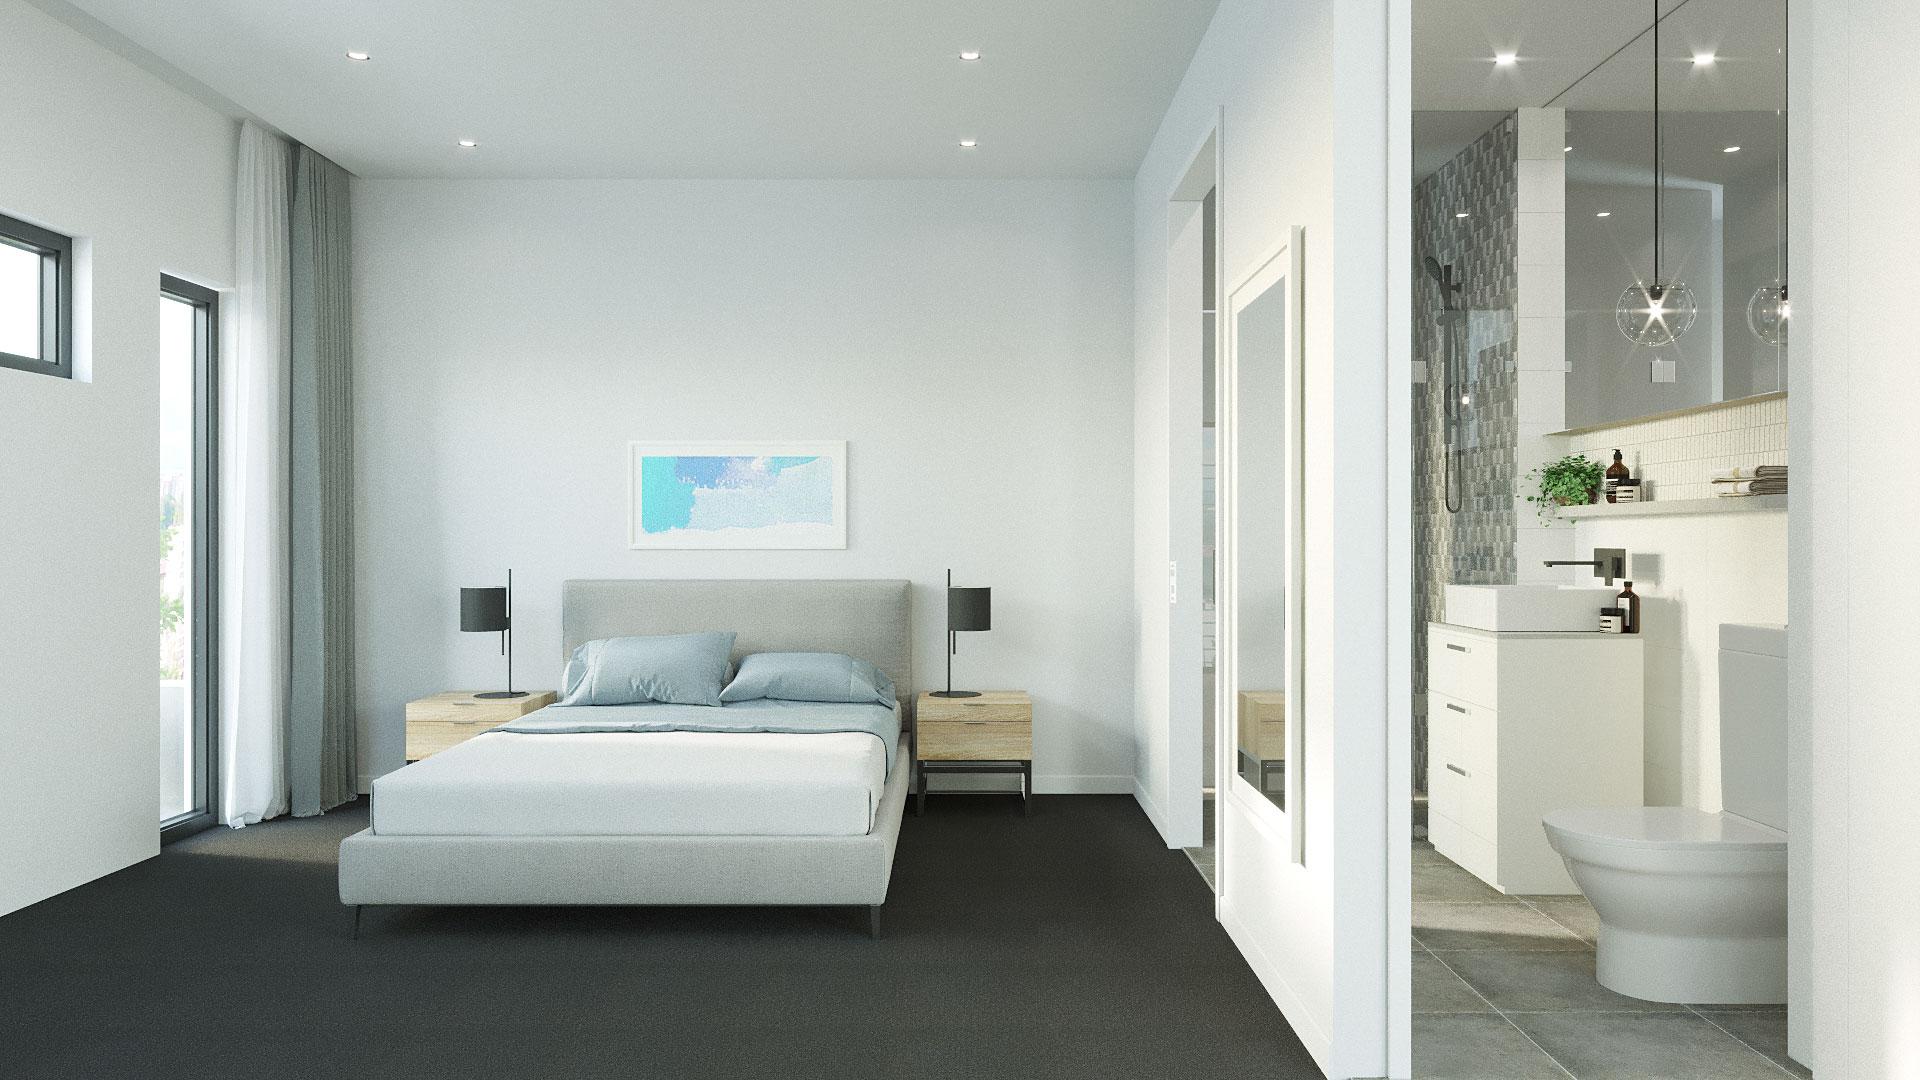 Arcviz-studio-3d-rendering-artist-impression-interior-bedroom-ensuite.jpg